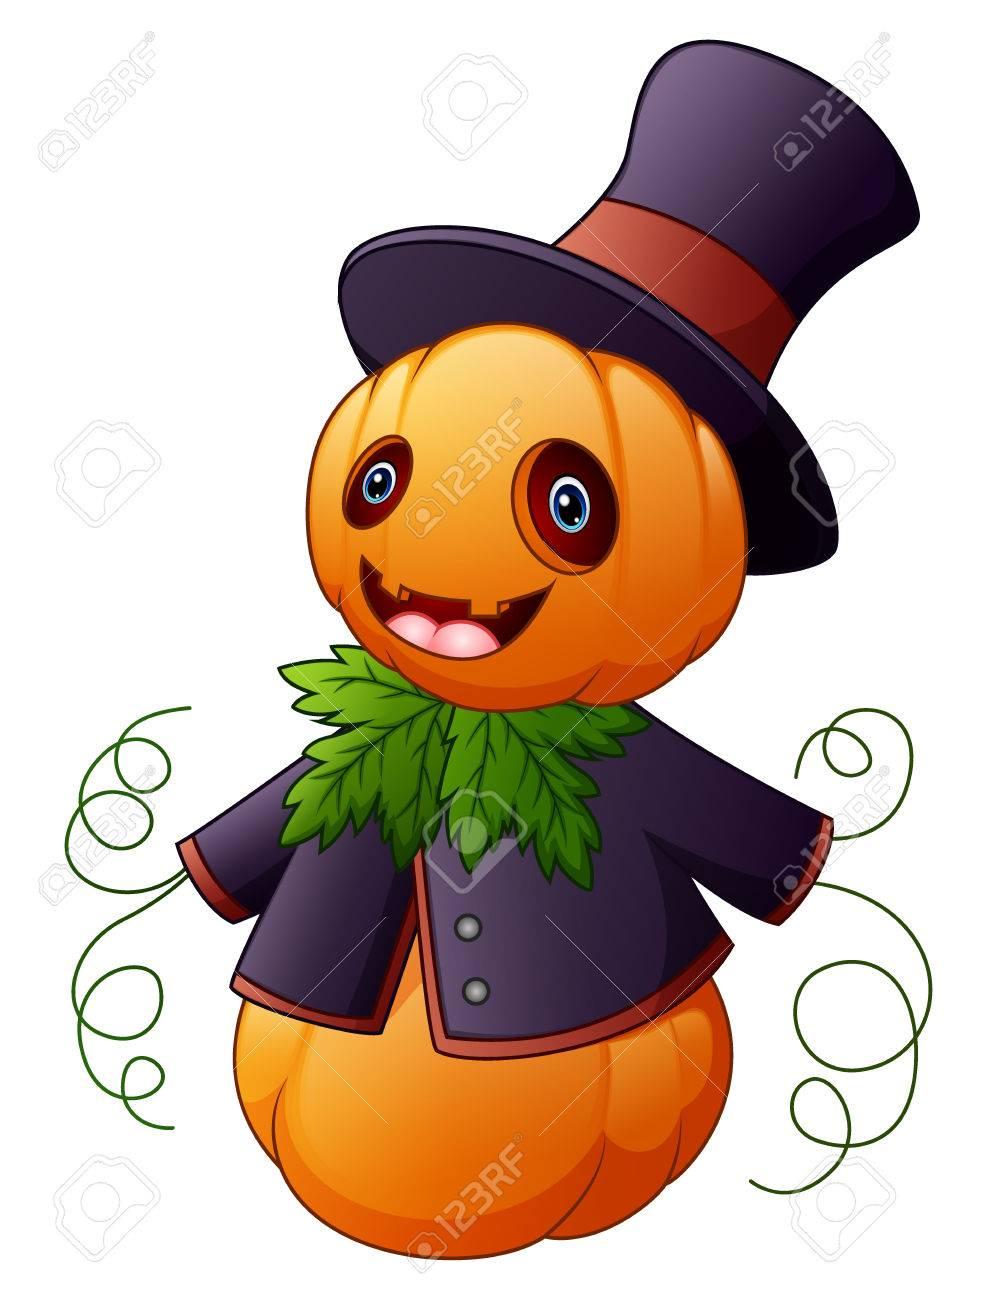 Halloween Cartoon Scarecrow With Pumpkin Head Stock Photo, Picture ...